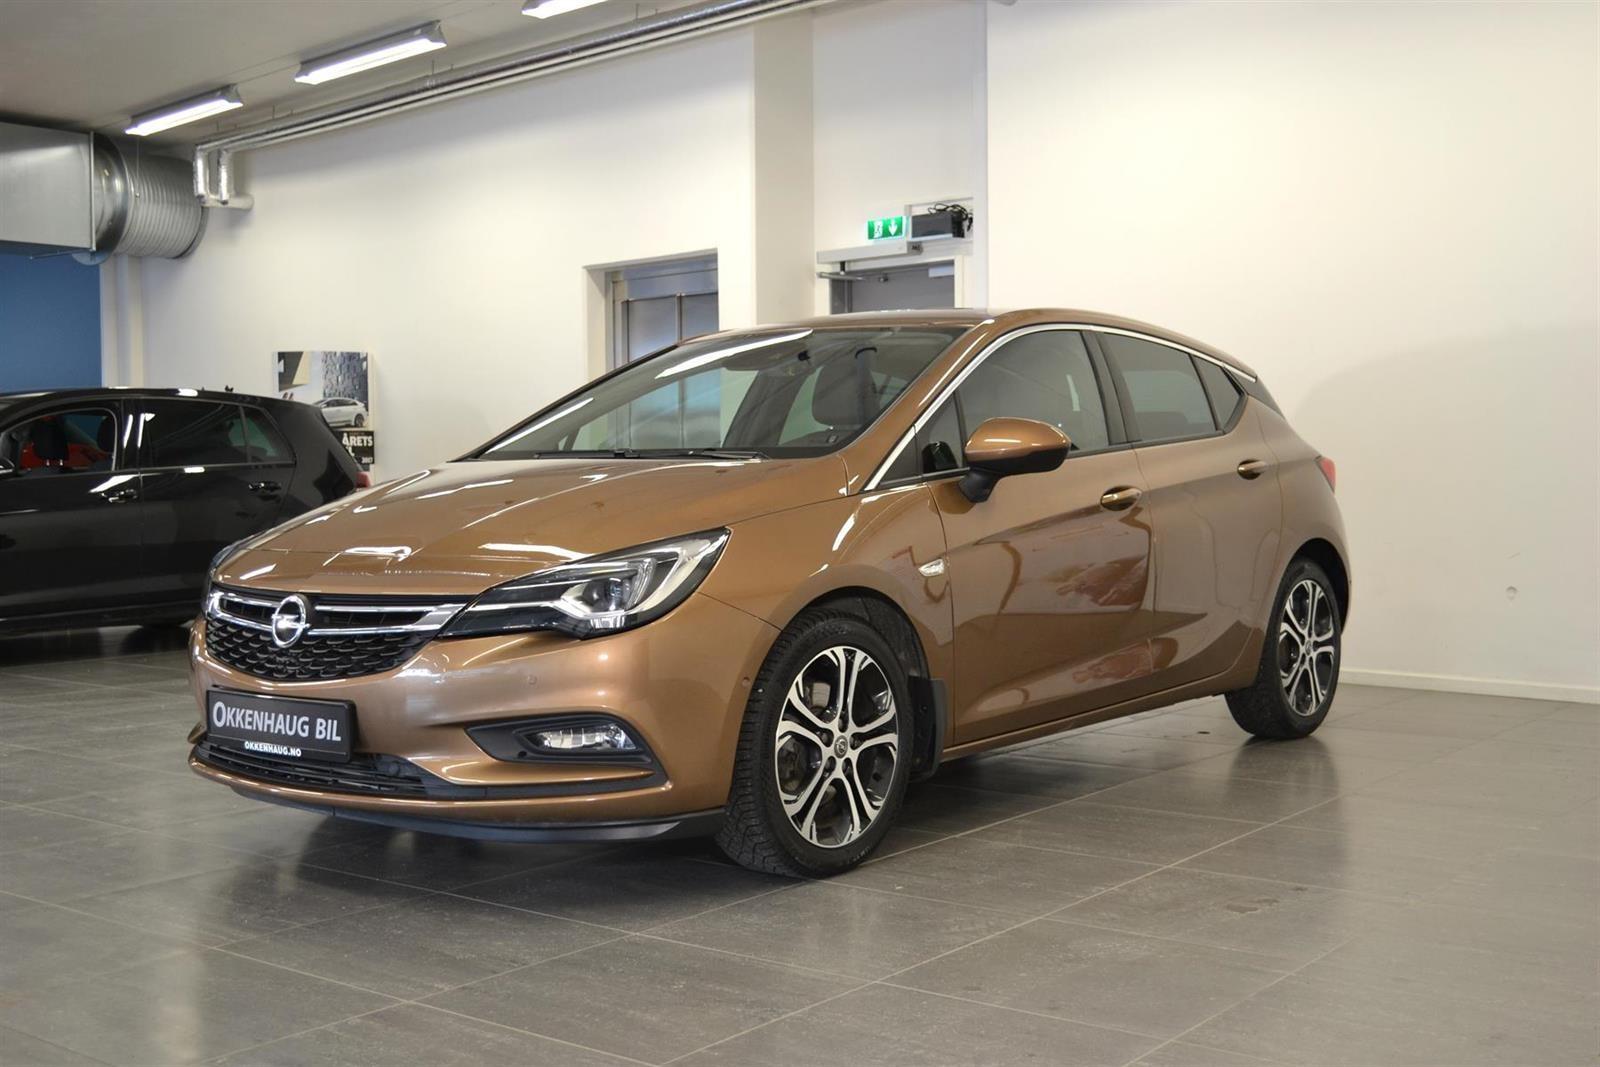 Opel Astra Slide 2